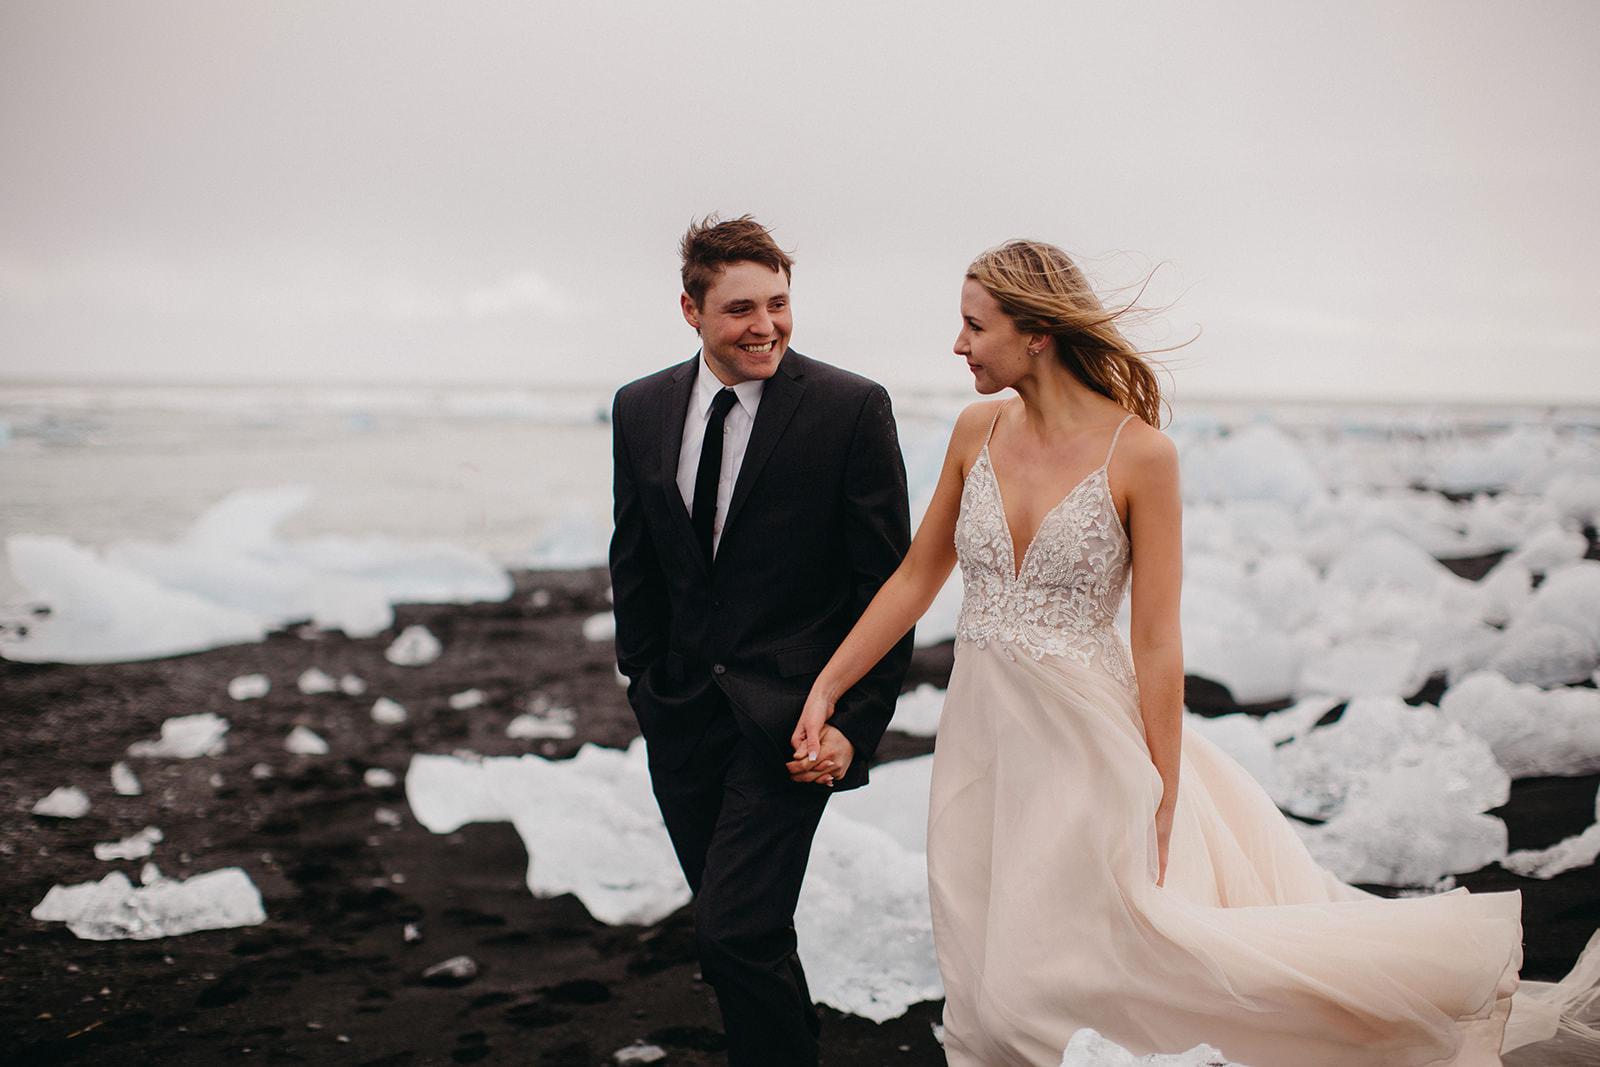 Icelandic Iceland Elopement Wedding Elope Photographer Eloping Reykjavík Vik Black Sand Beach Jökulsárlón Skogafoss Waterfall Vestrahorn Mountain Liz Osban Photography Destination 59.jpg